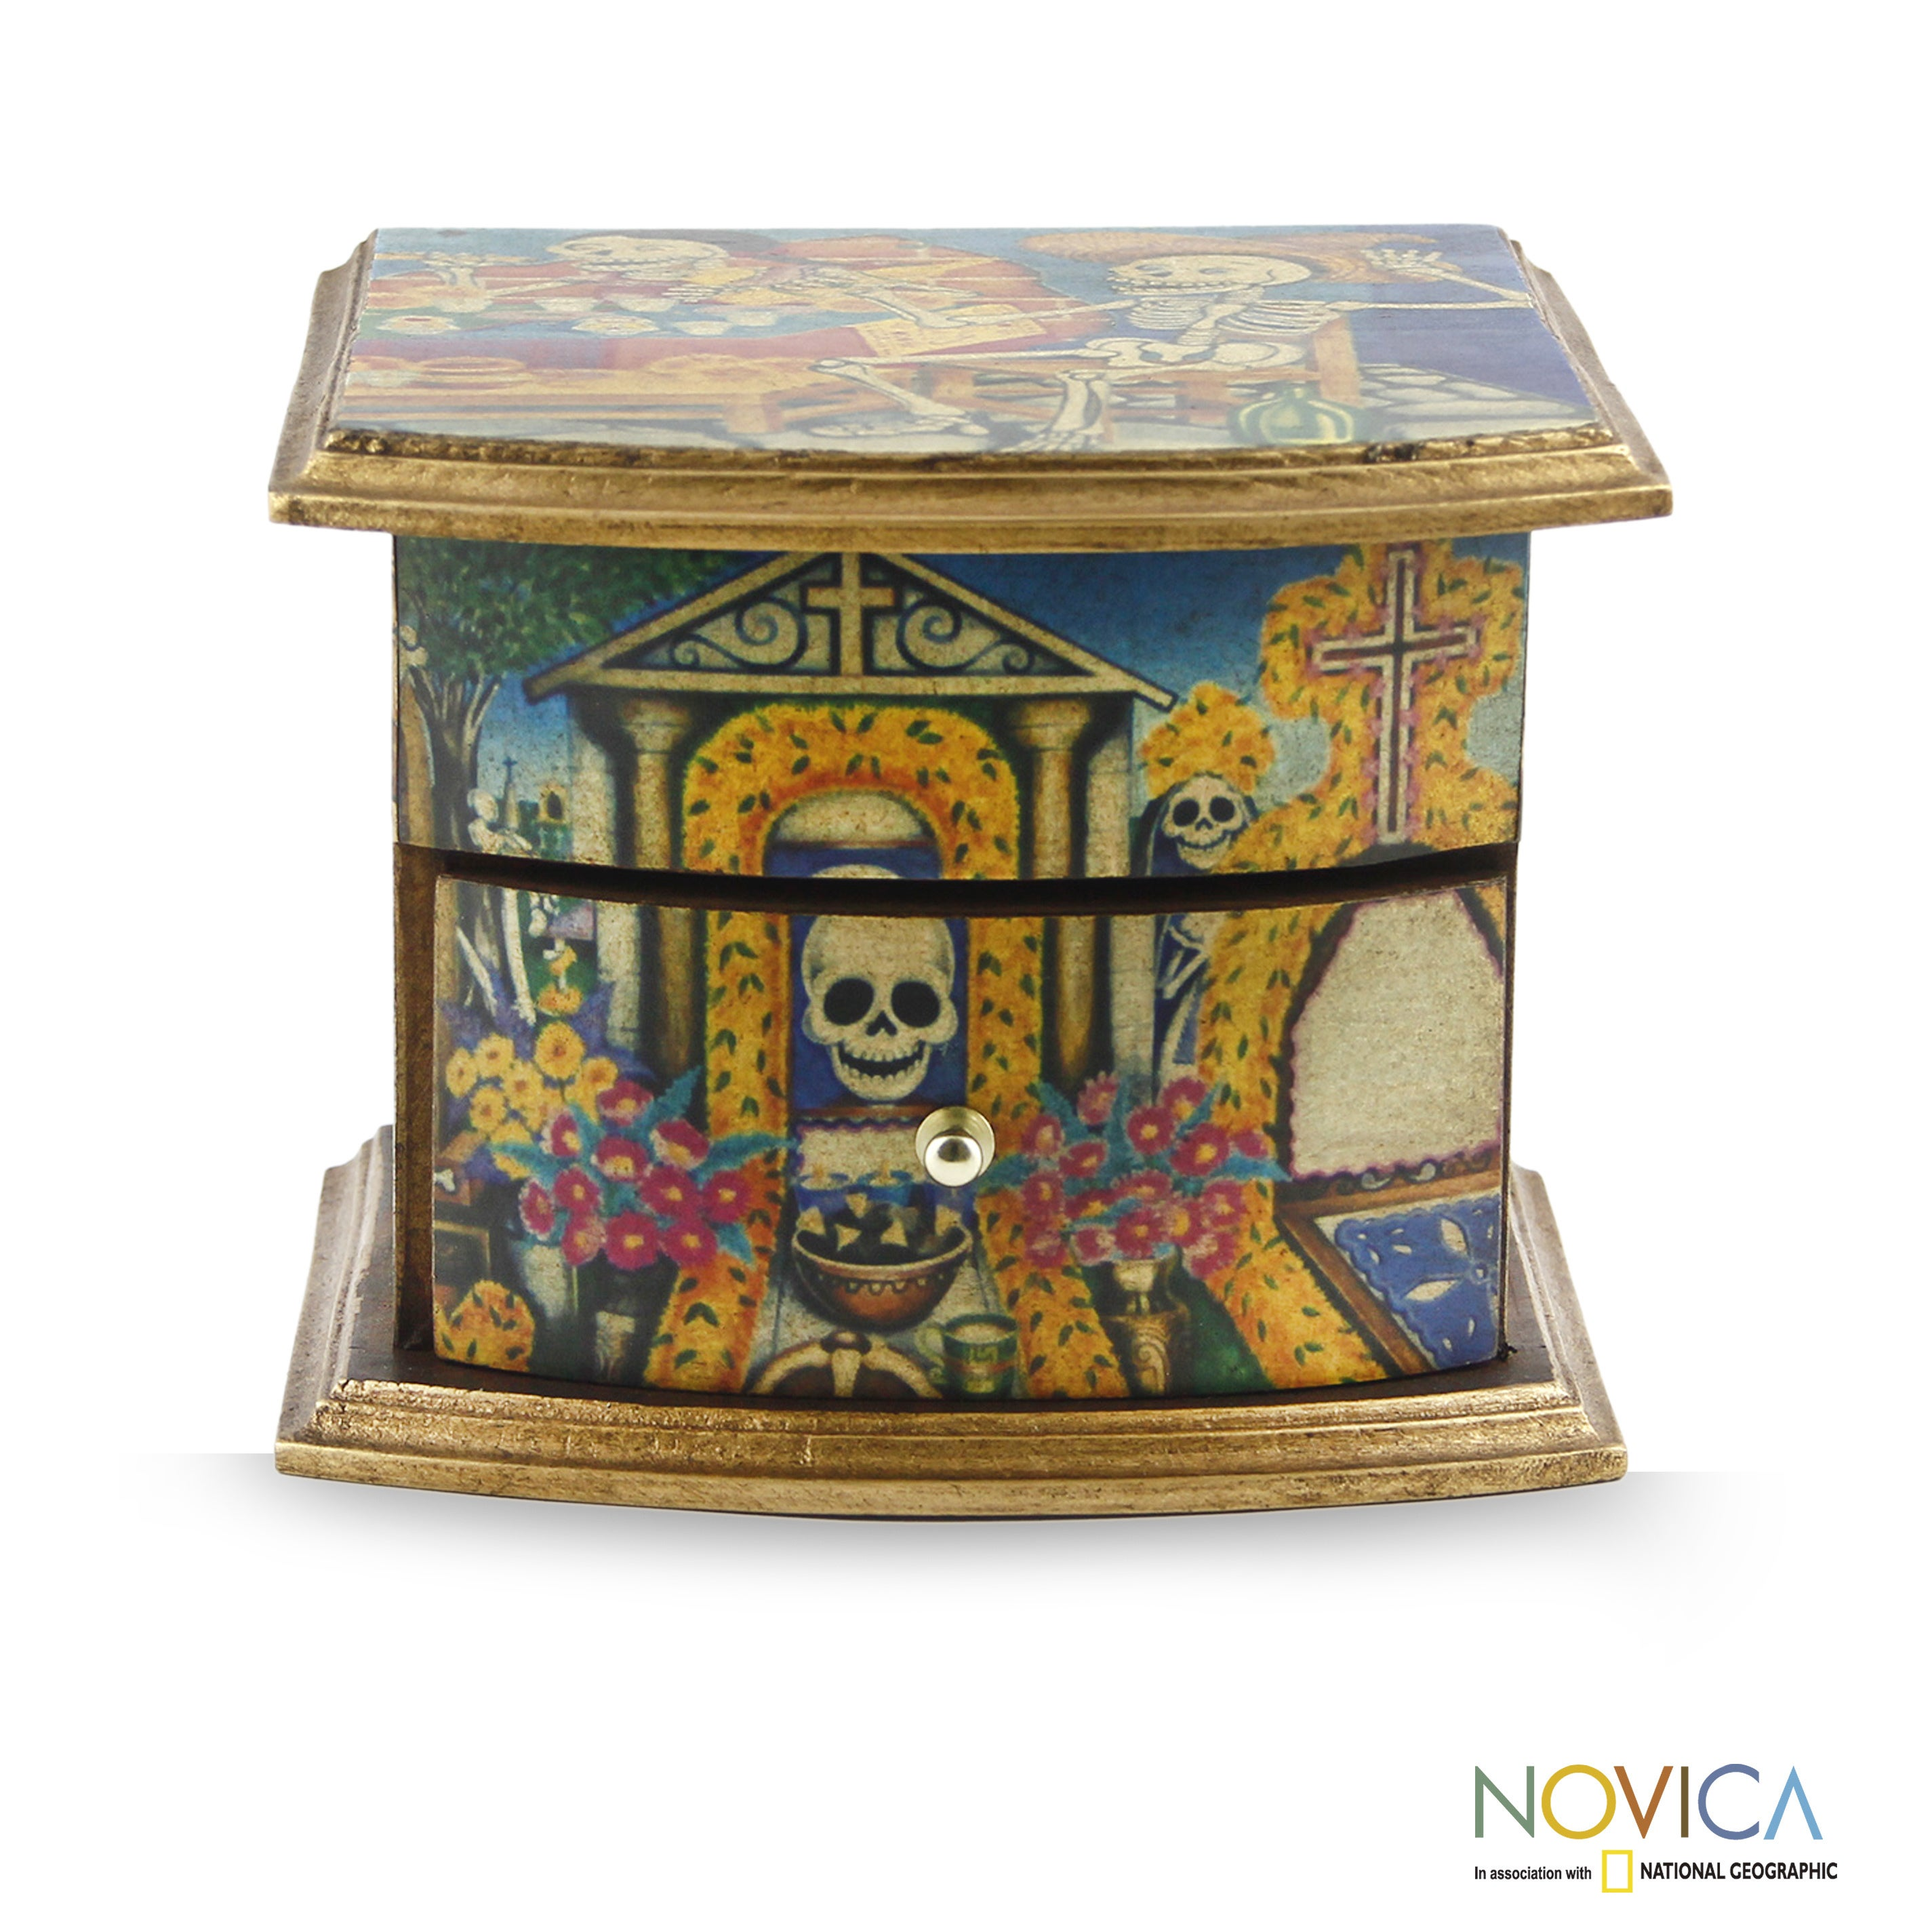 Handmade Pinewood Day Of The Dead Celebrations Decoupage Jewelry Box Mexico